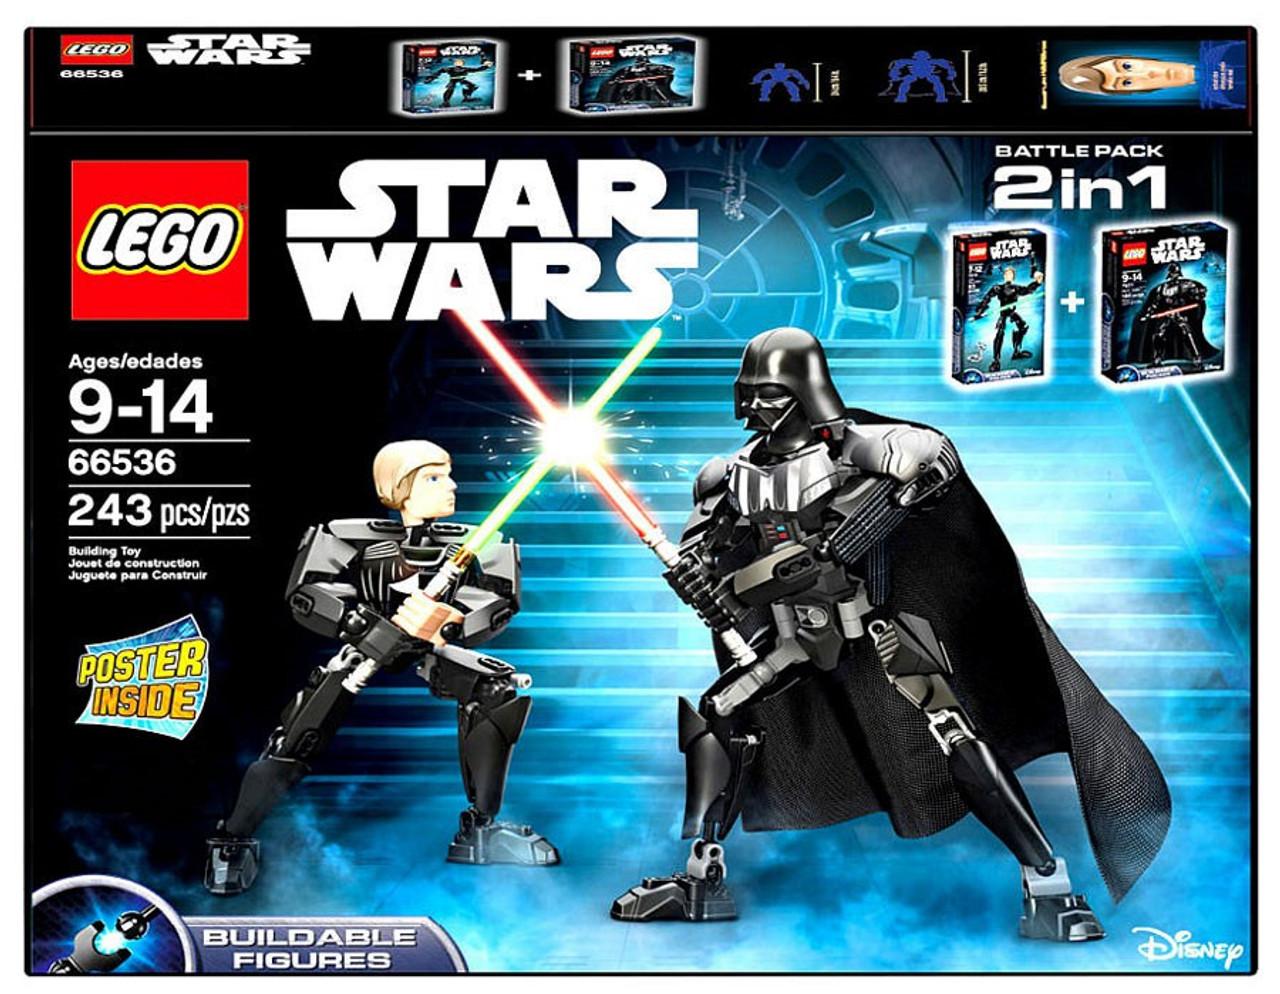 LEGO STAR WARS 2016 Poster ~ LUKE /& DARTH VADER NEW